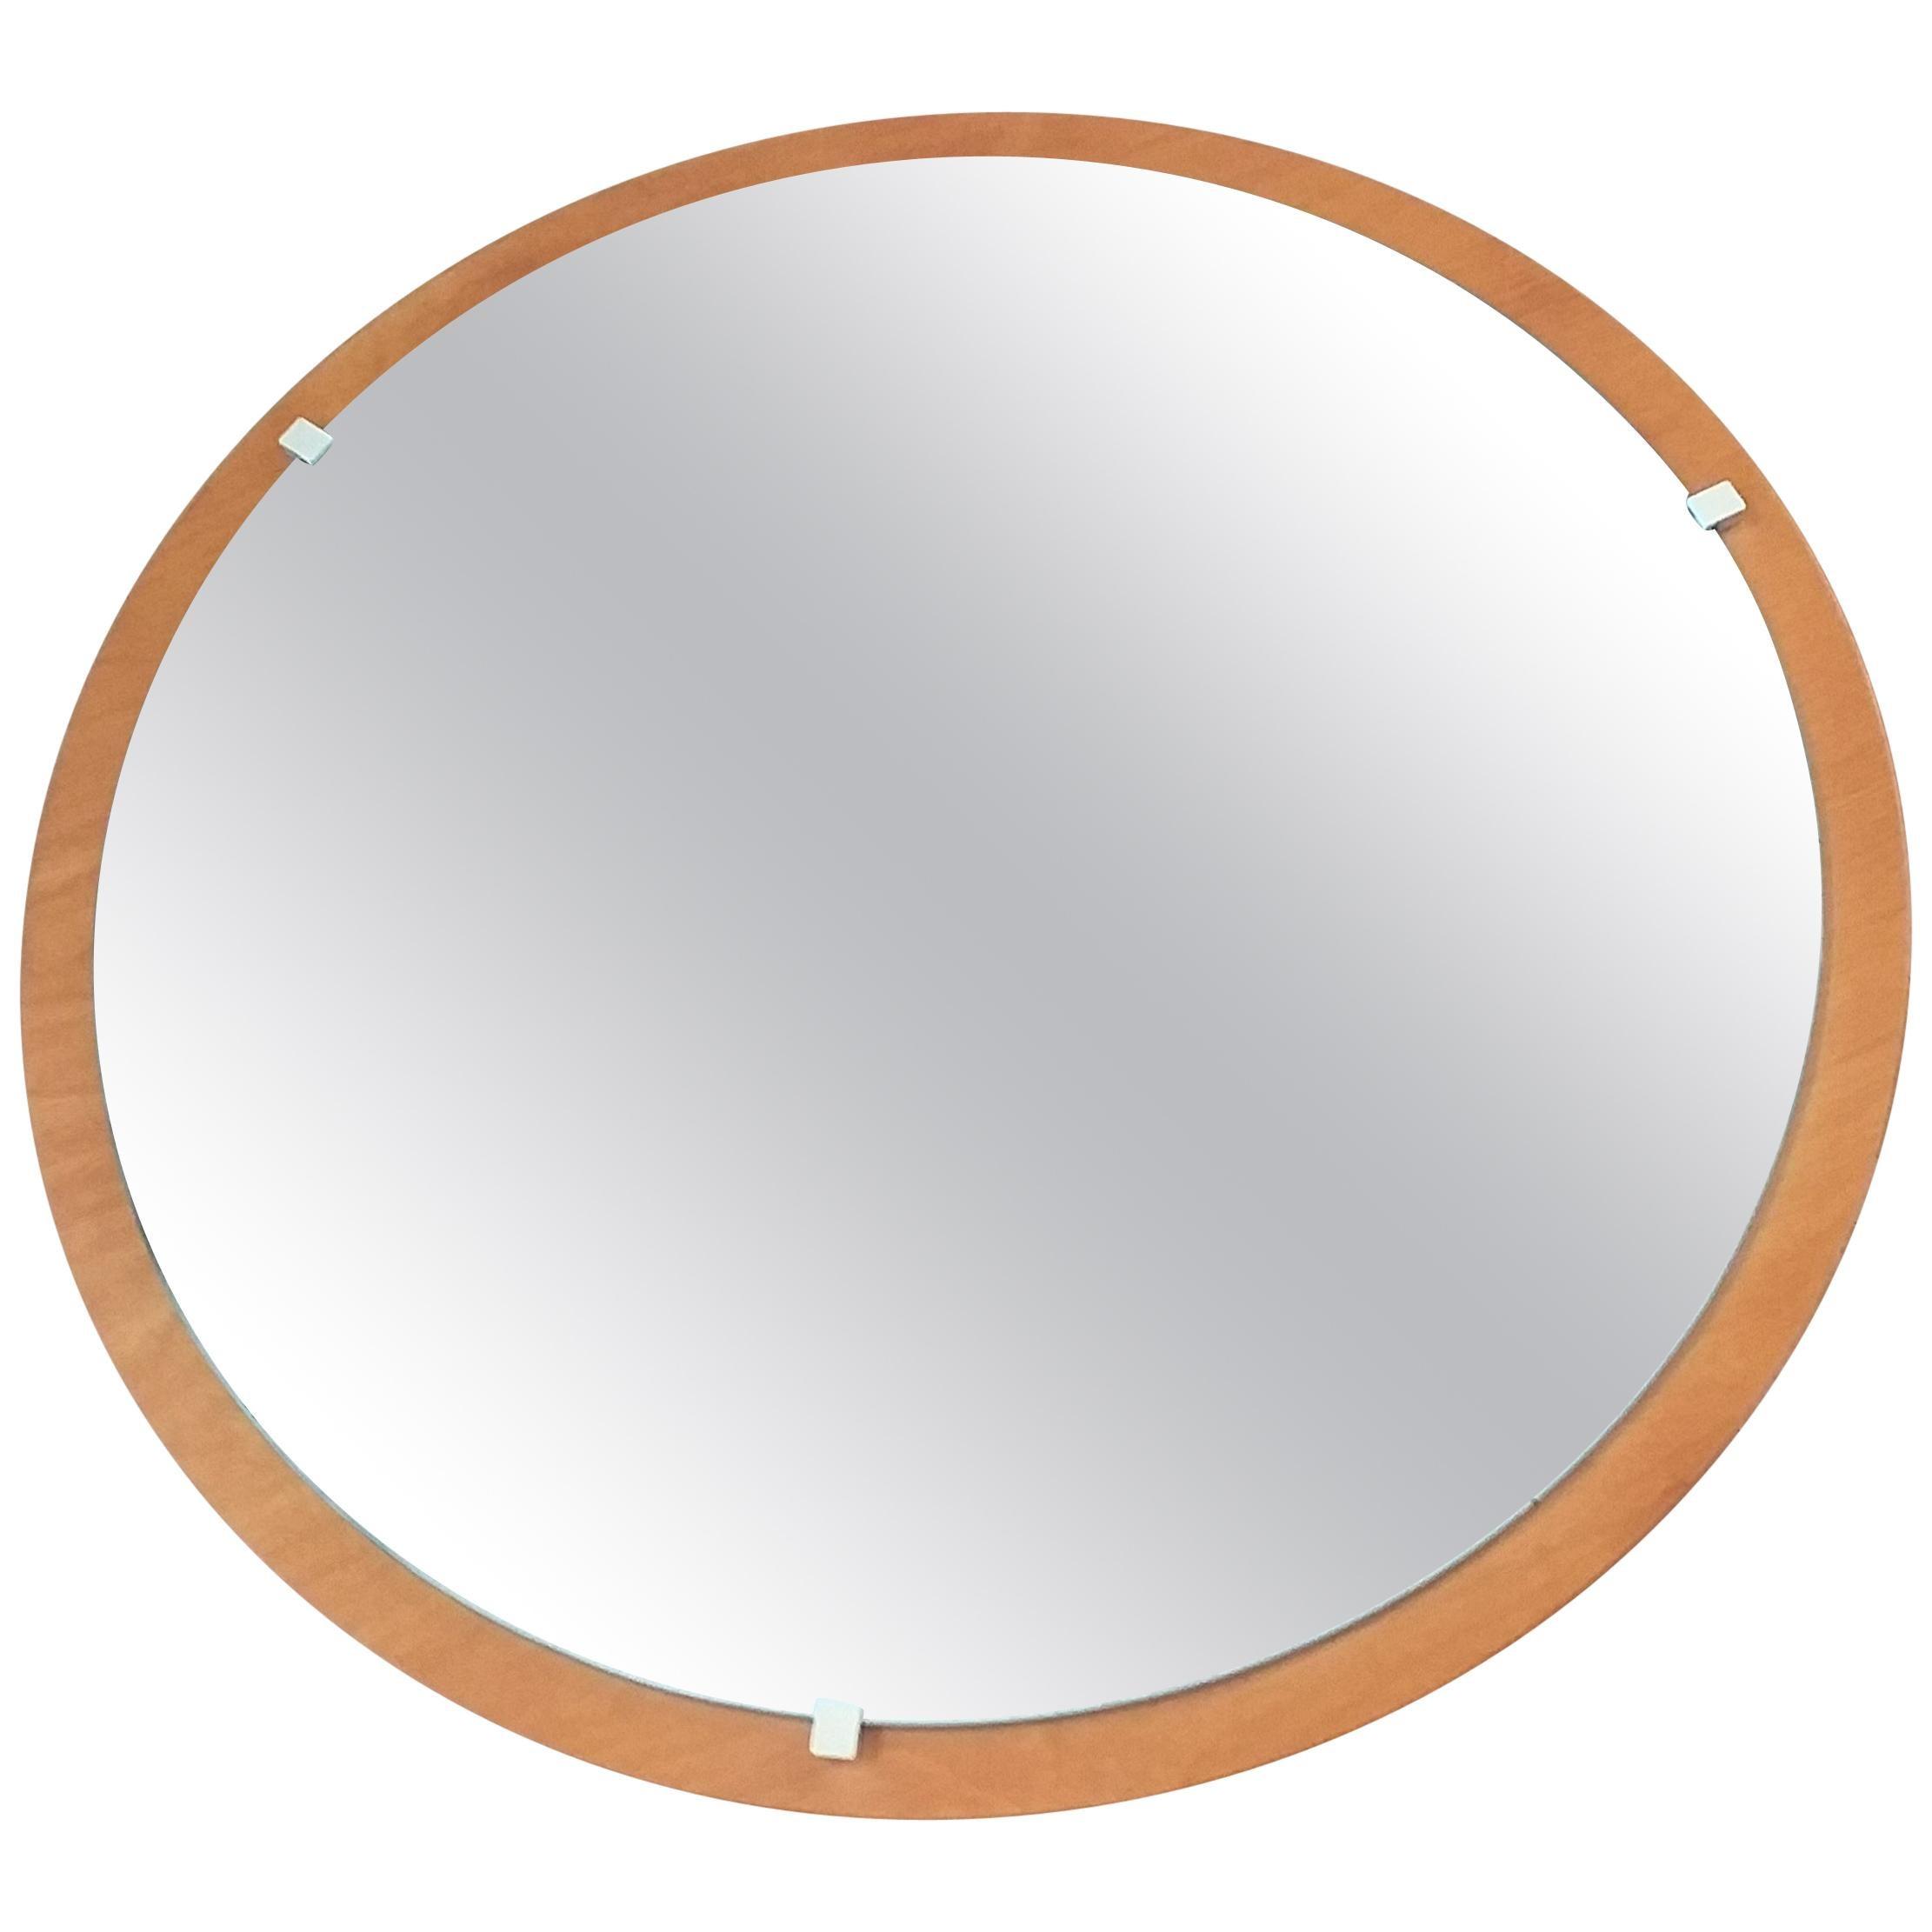 Midcentury Round Teak Veneer Wall Mirror, Denmark, 1960s